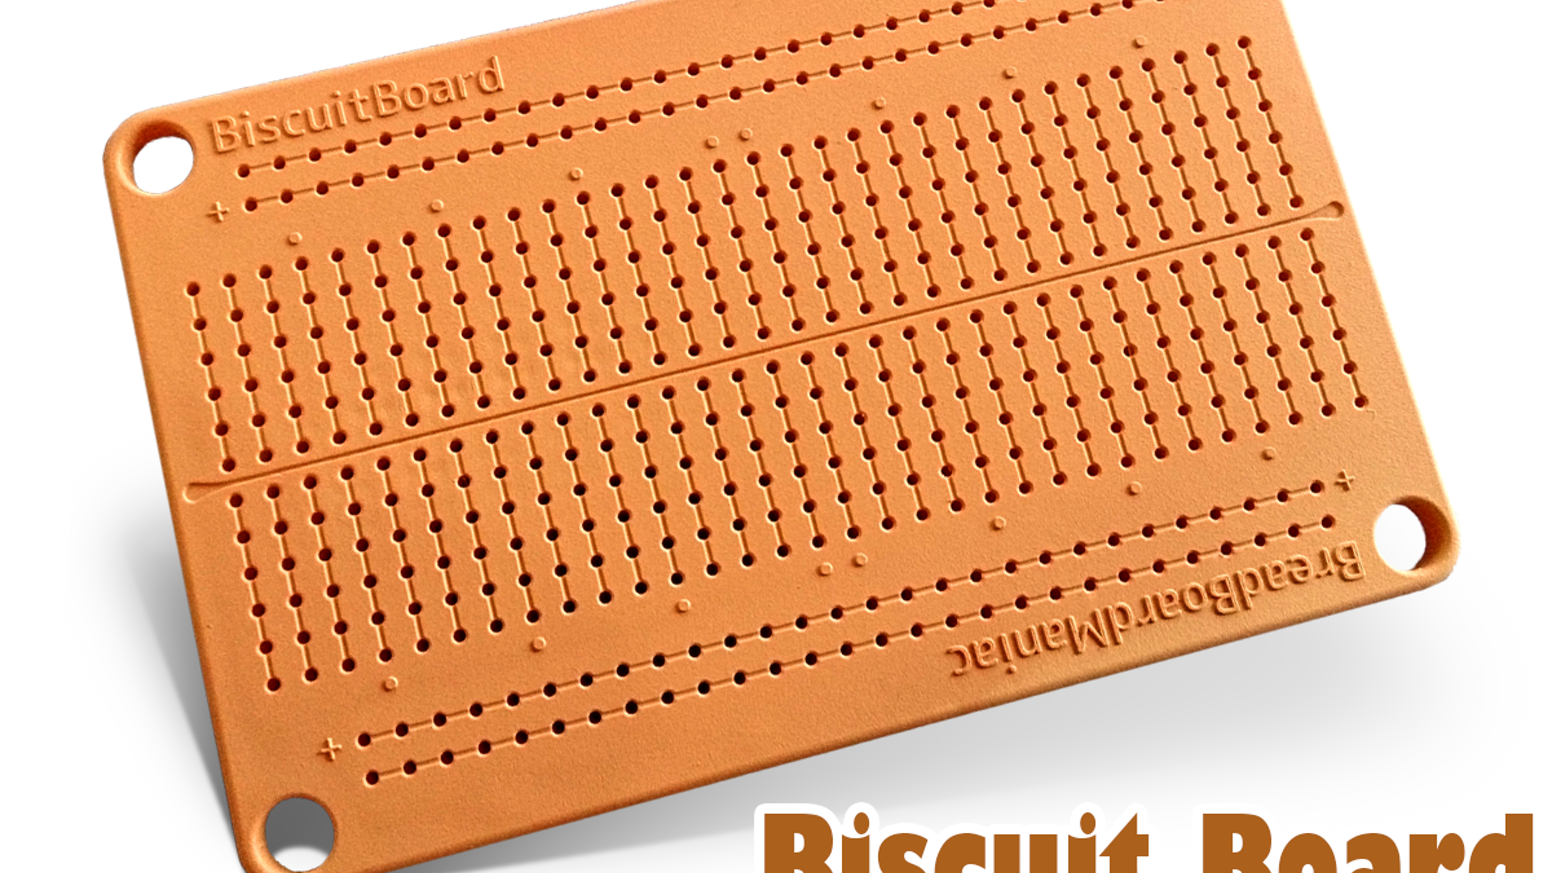 Biscuit Board Solderless Prototyping By Frentrep Kickstarter Bread Circuit